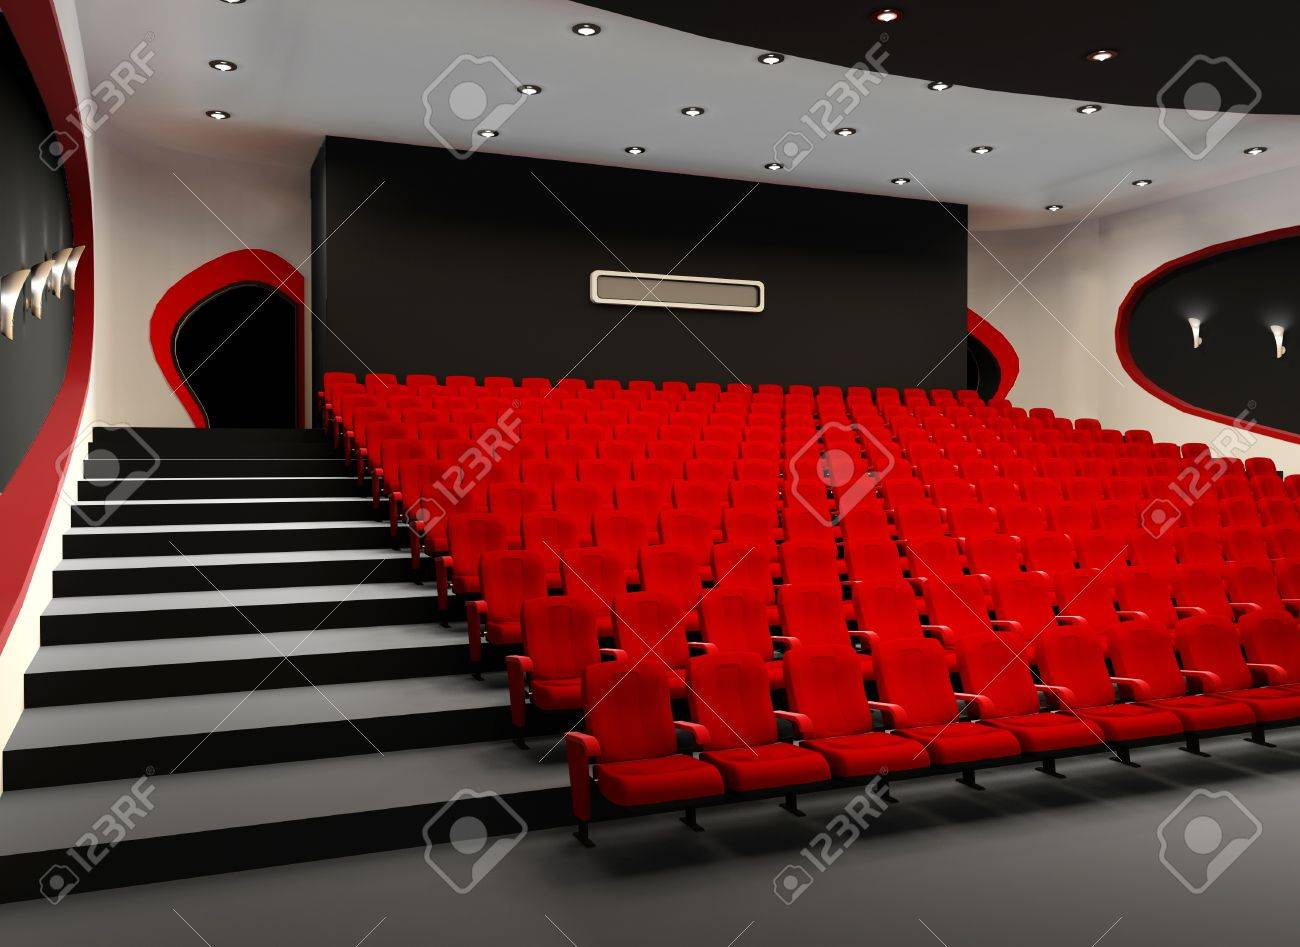 Desolate red cinema hall with comfortable velvet armchairs Stock Photo - 11405384